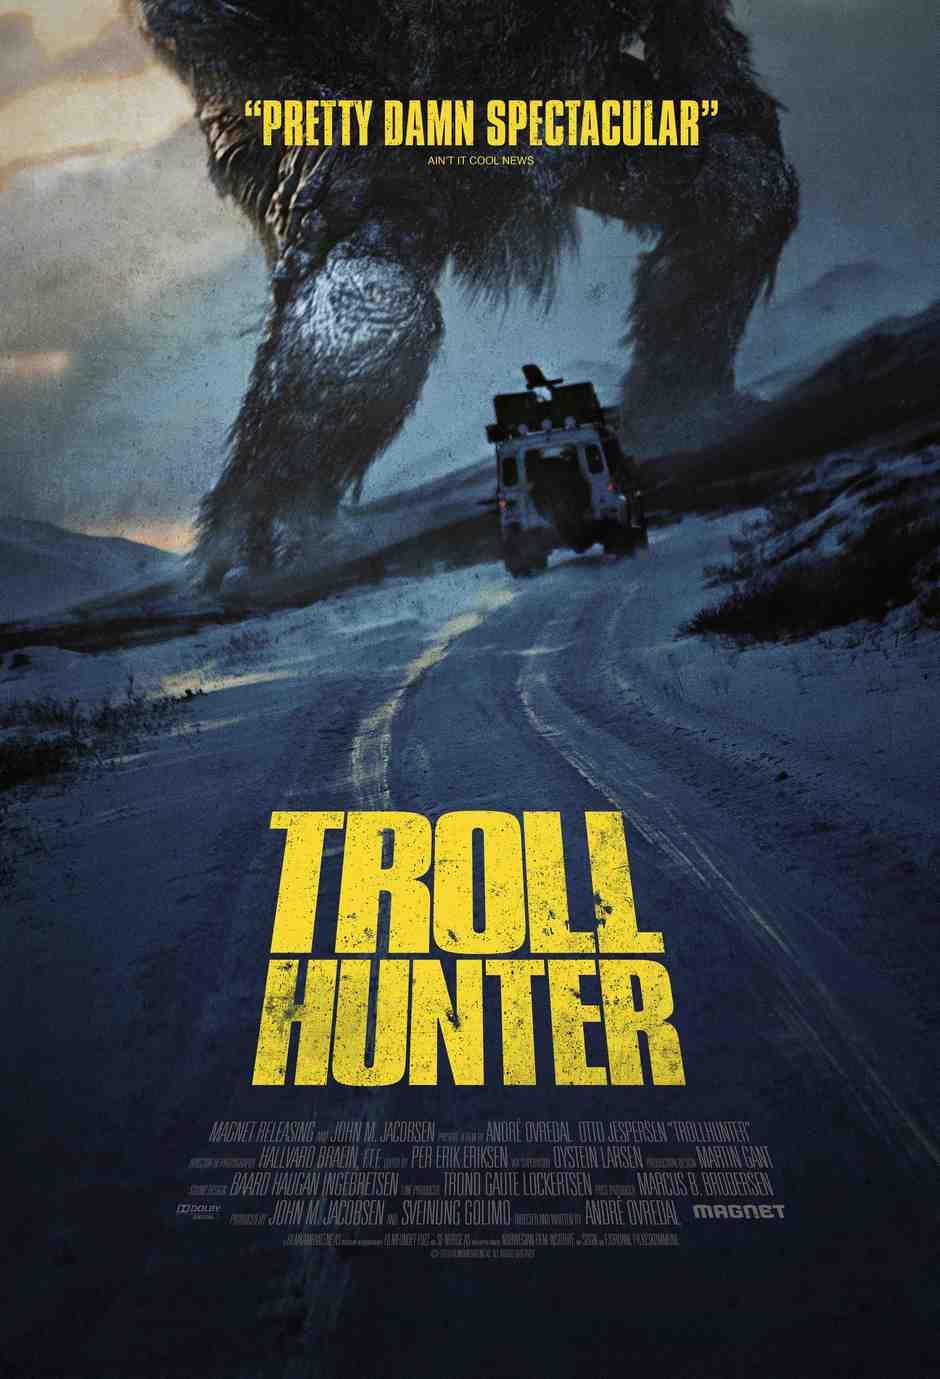 trollhunter_poster_2010_03.jpg